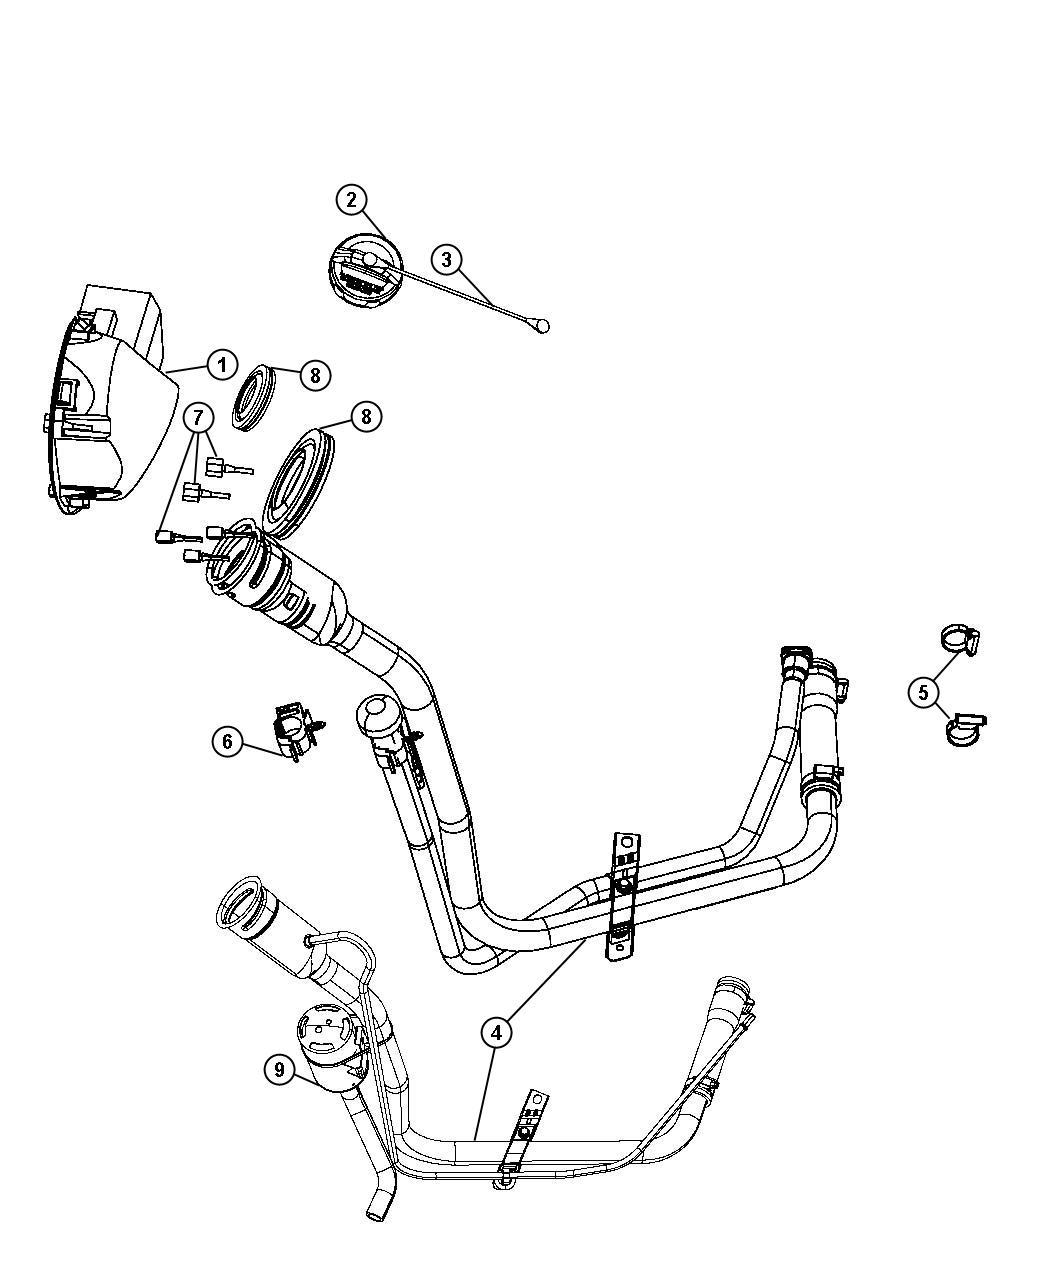 Dodge Nitro Filter Leak Detection Pump Leak Detection